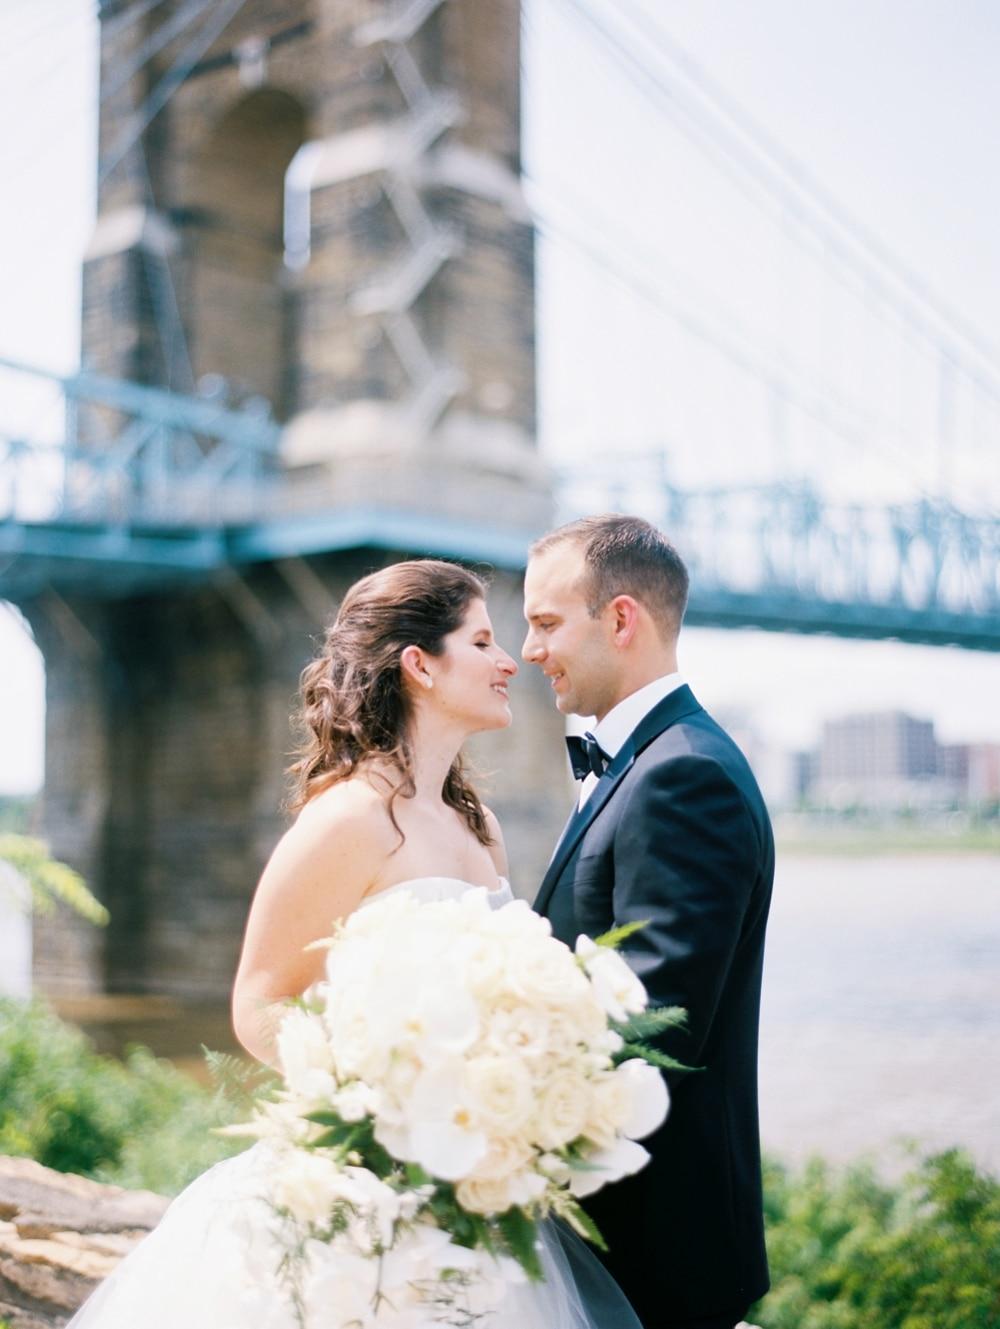 kristin-la-voie-photography-Cincinnati-Music-Hall-Wedding-128